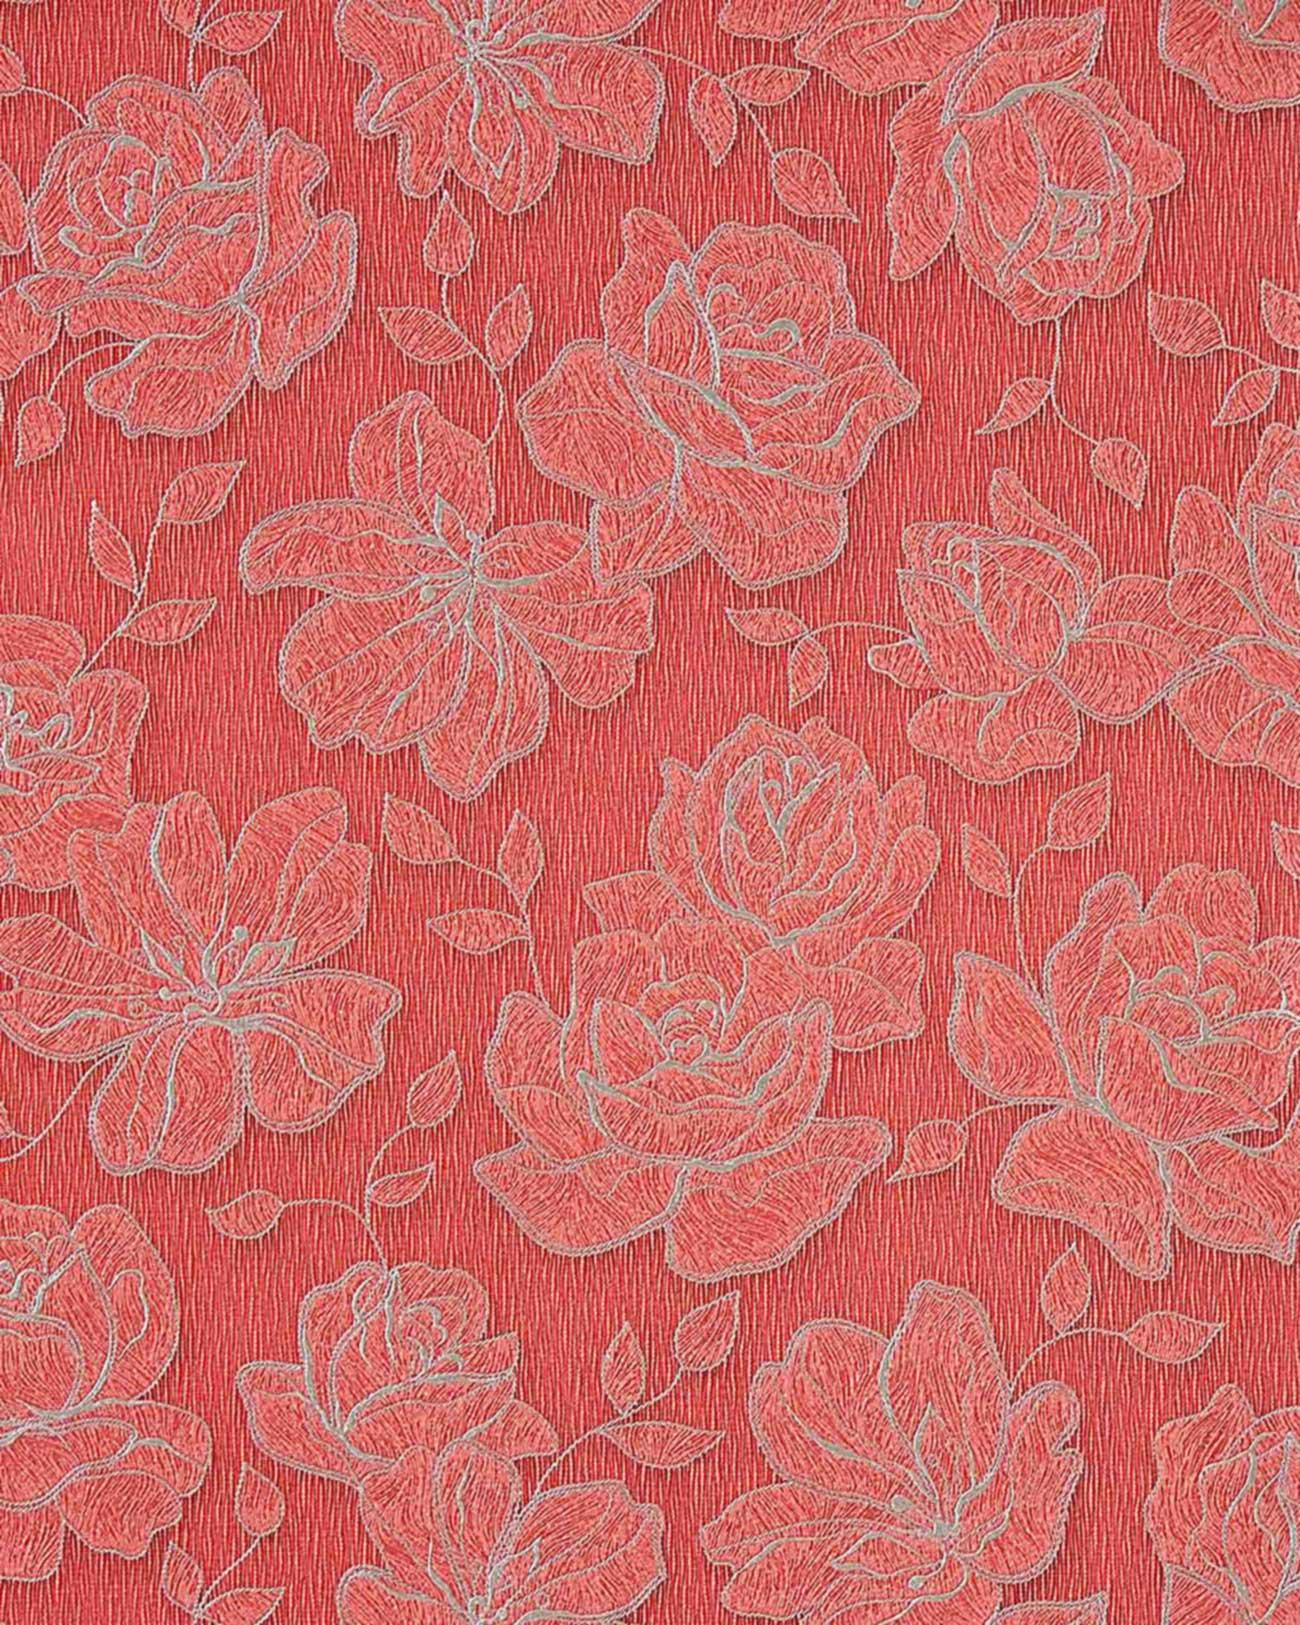 edem 173 34 papier peint design motif floral rouge carmin brun rouge argent ebay. Black Bedroom Furniture Sets. Home Design Ideas